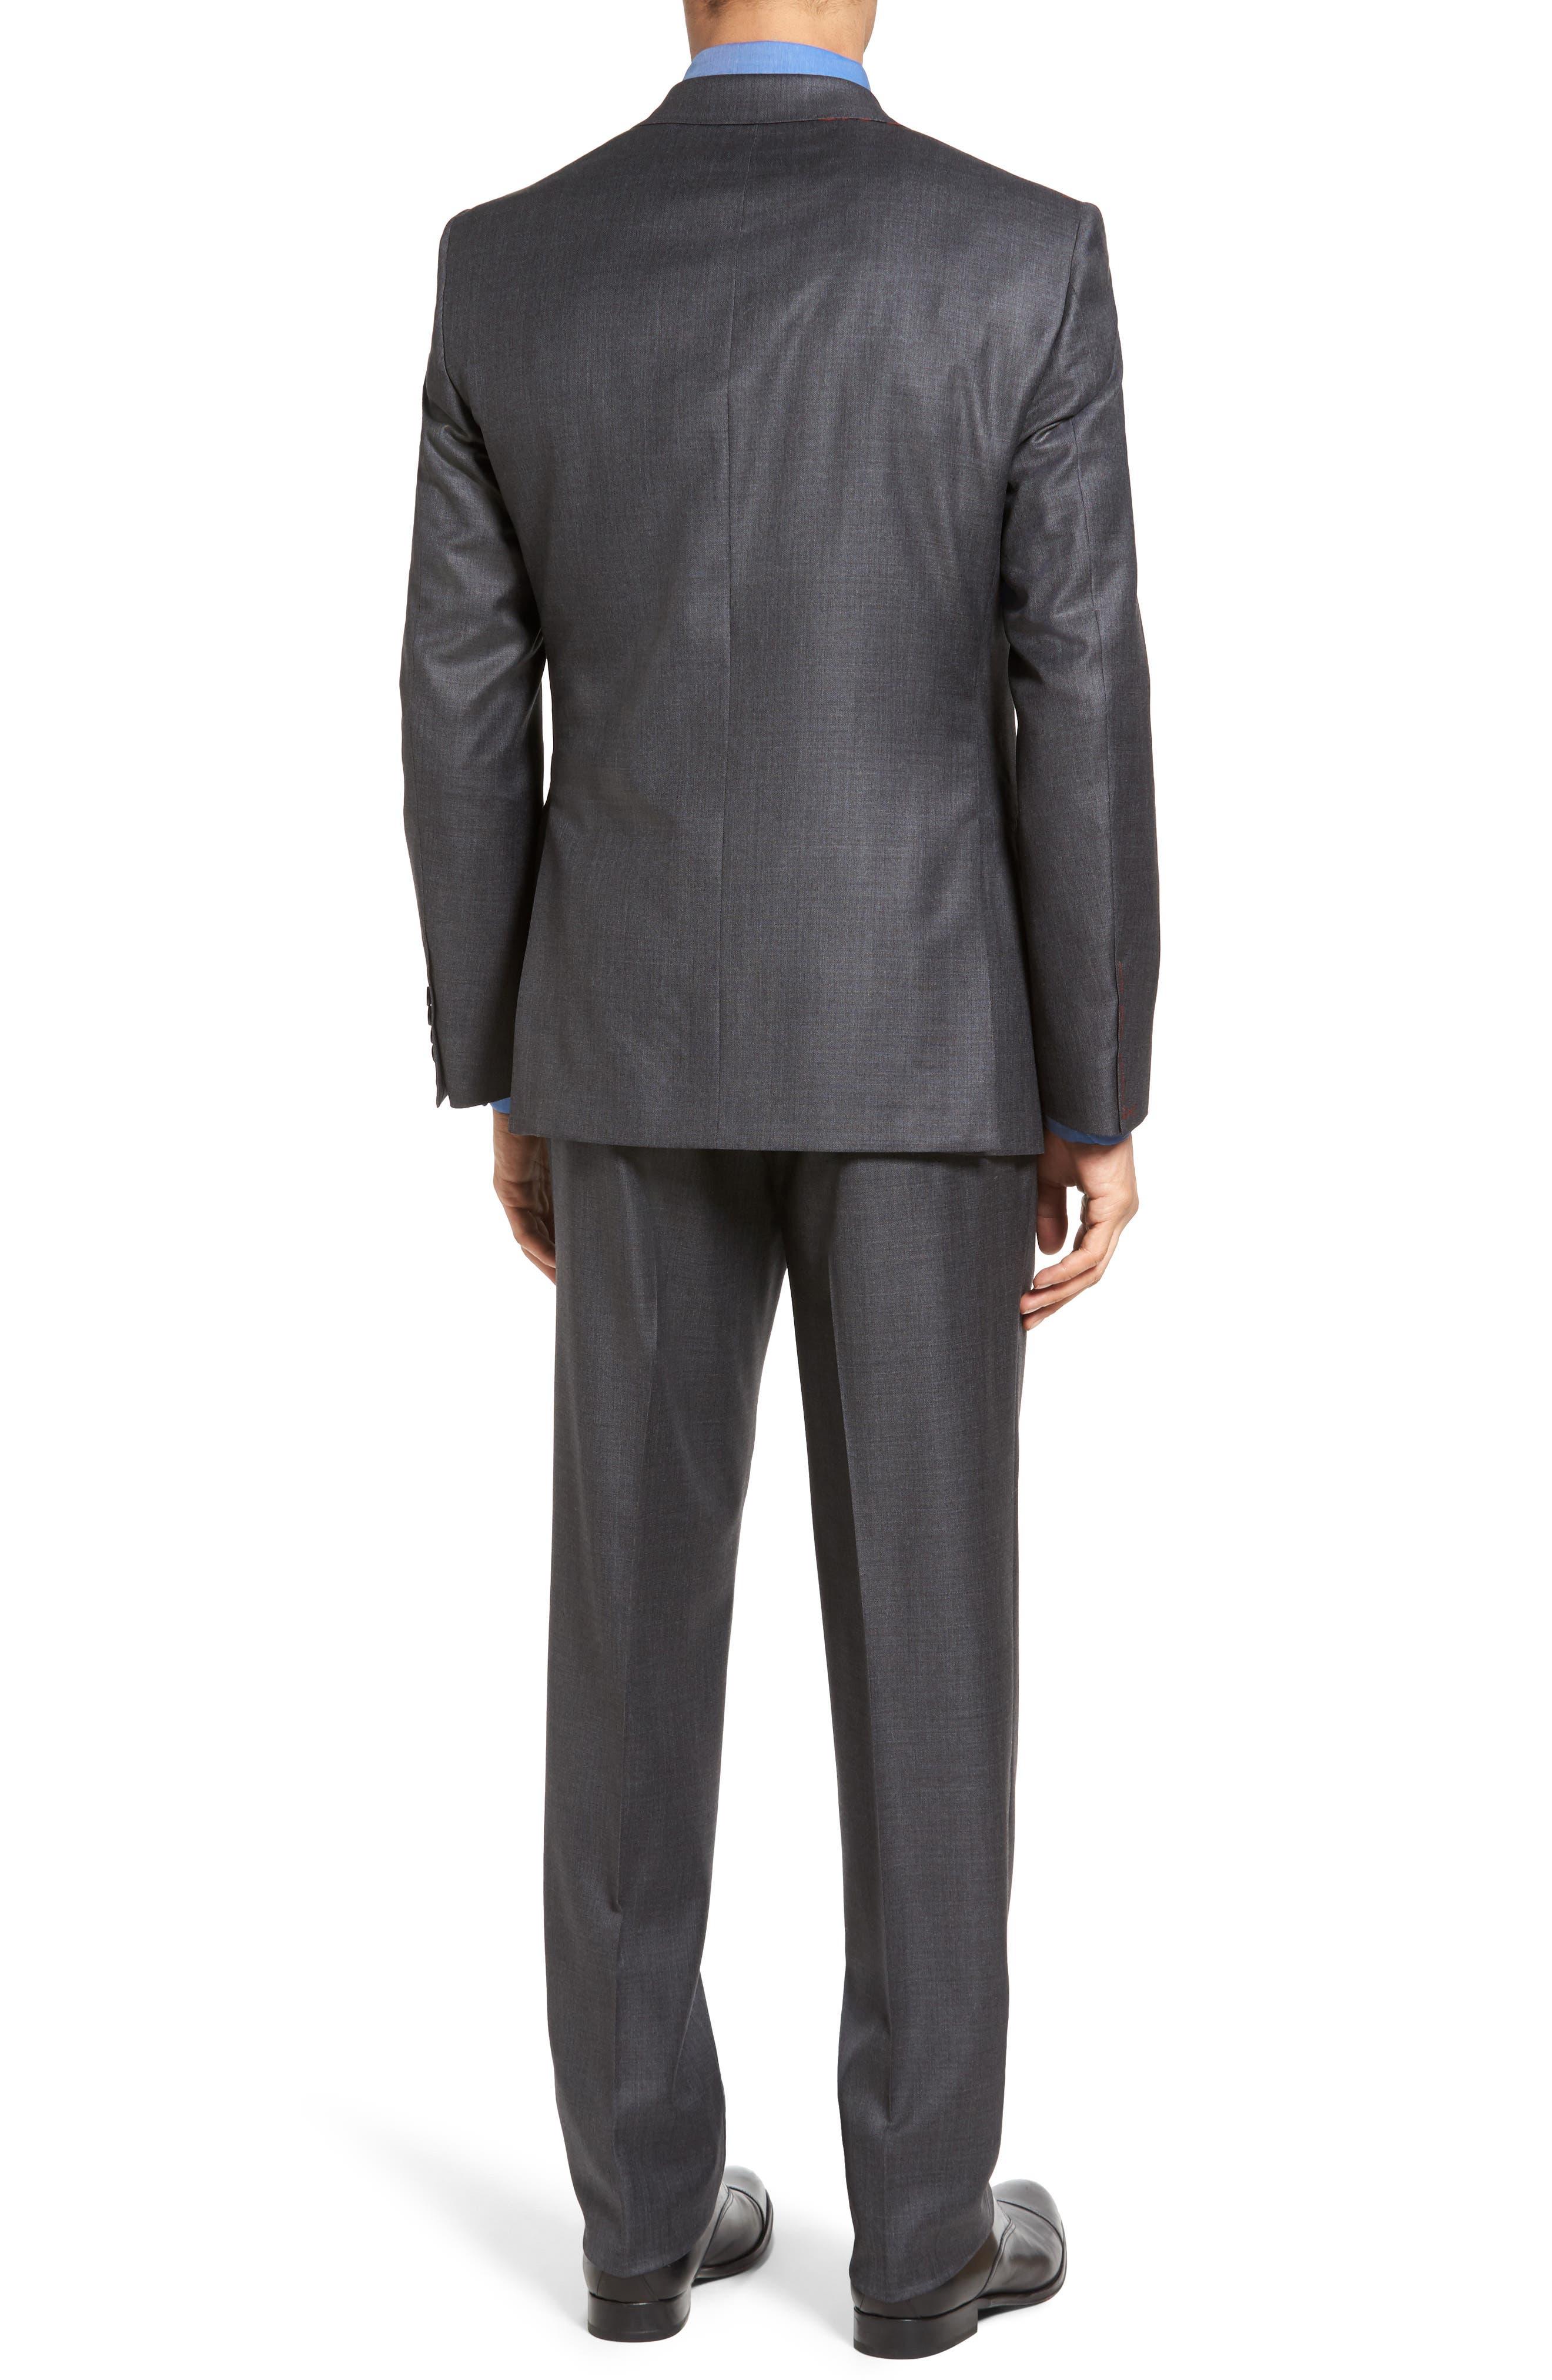 SAMUELSOHN,                             Beckett Classic Fit Sharkskin Wool Suit,                             Alternate thumbnail 2, color,                             020